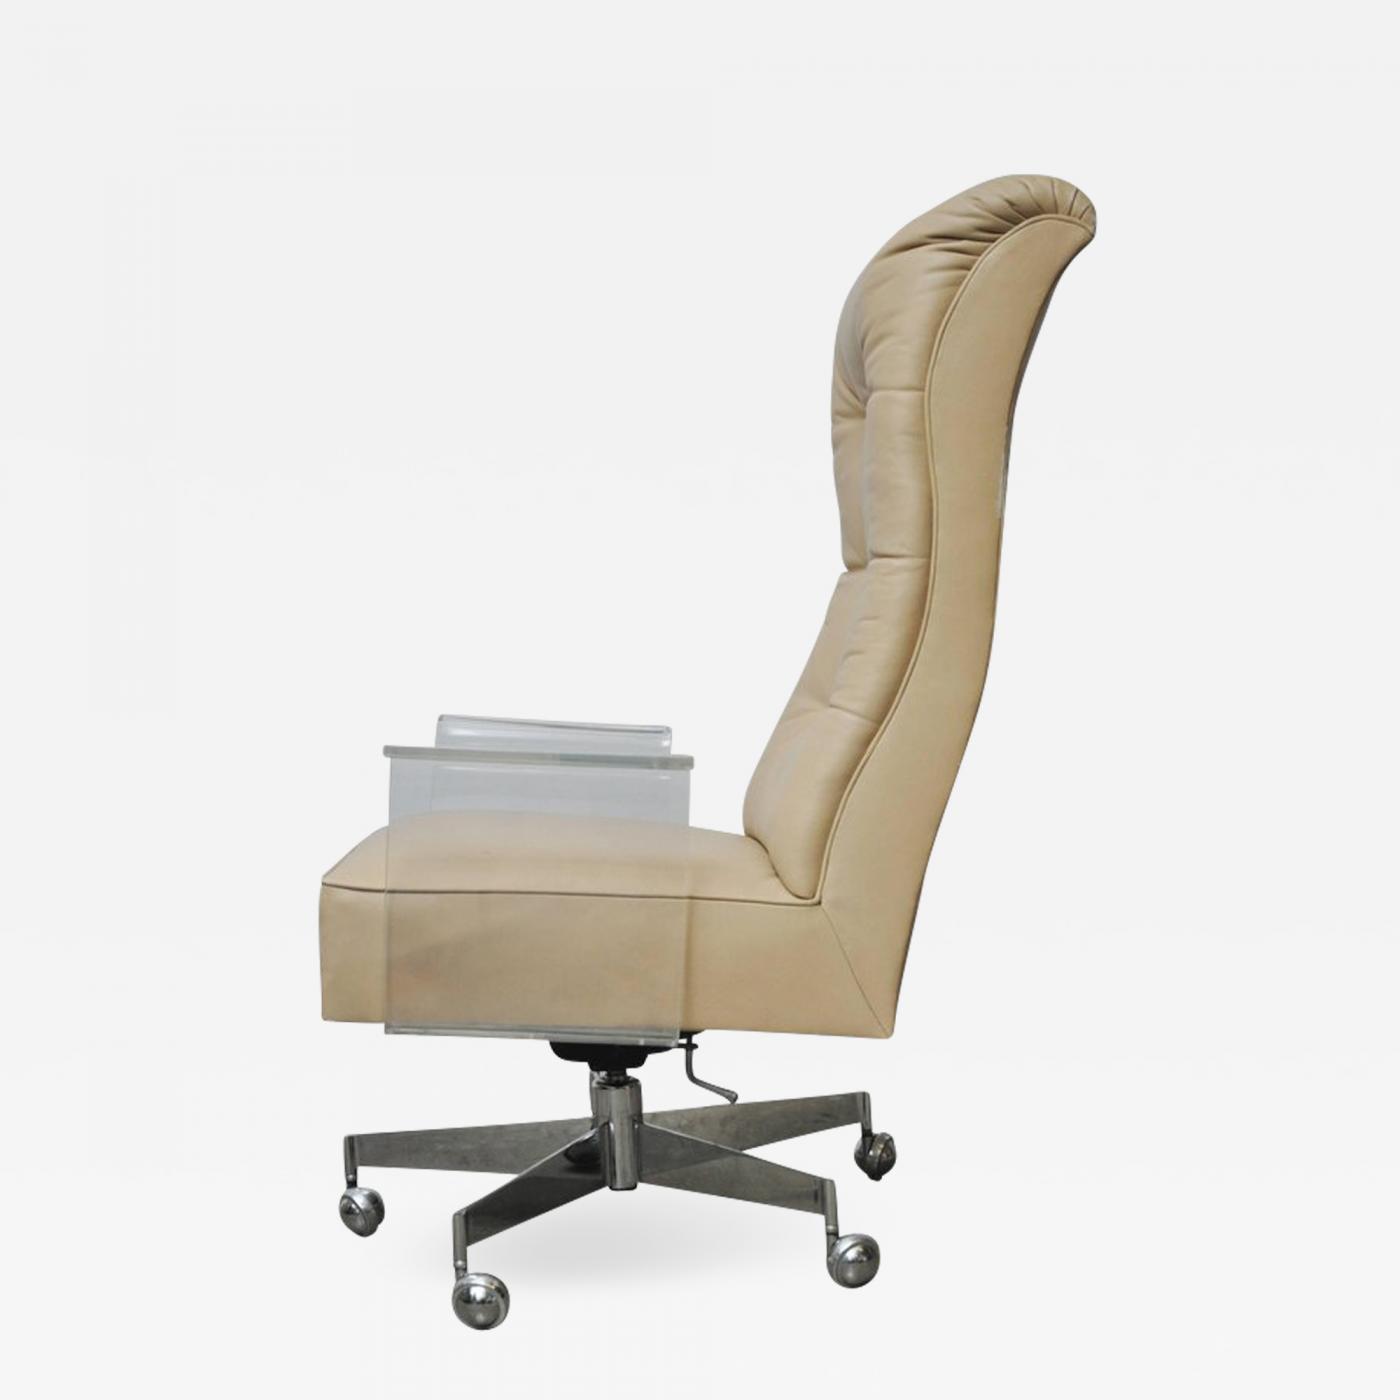 Image of: Vladimir Kagan Vladimir Kagan Leather Desk Chair With Lucite Arms